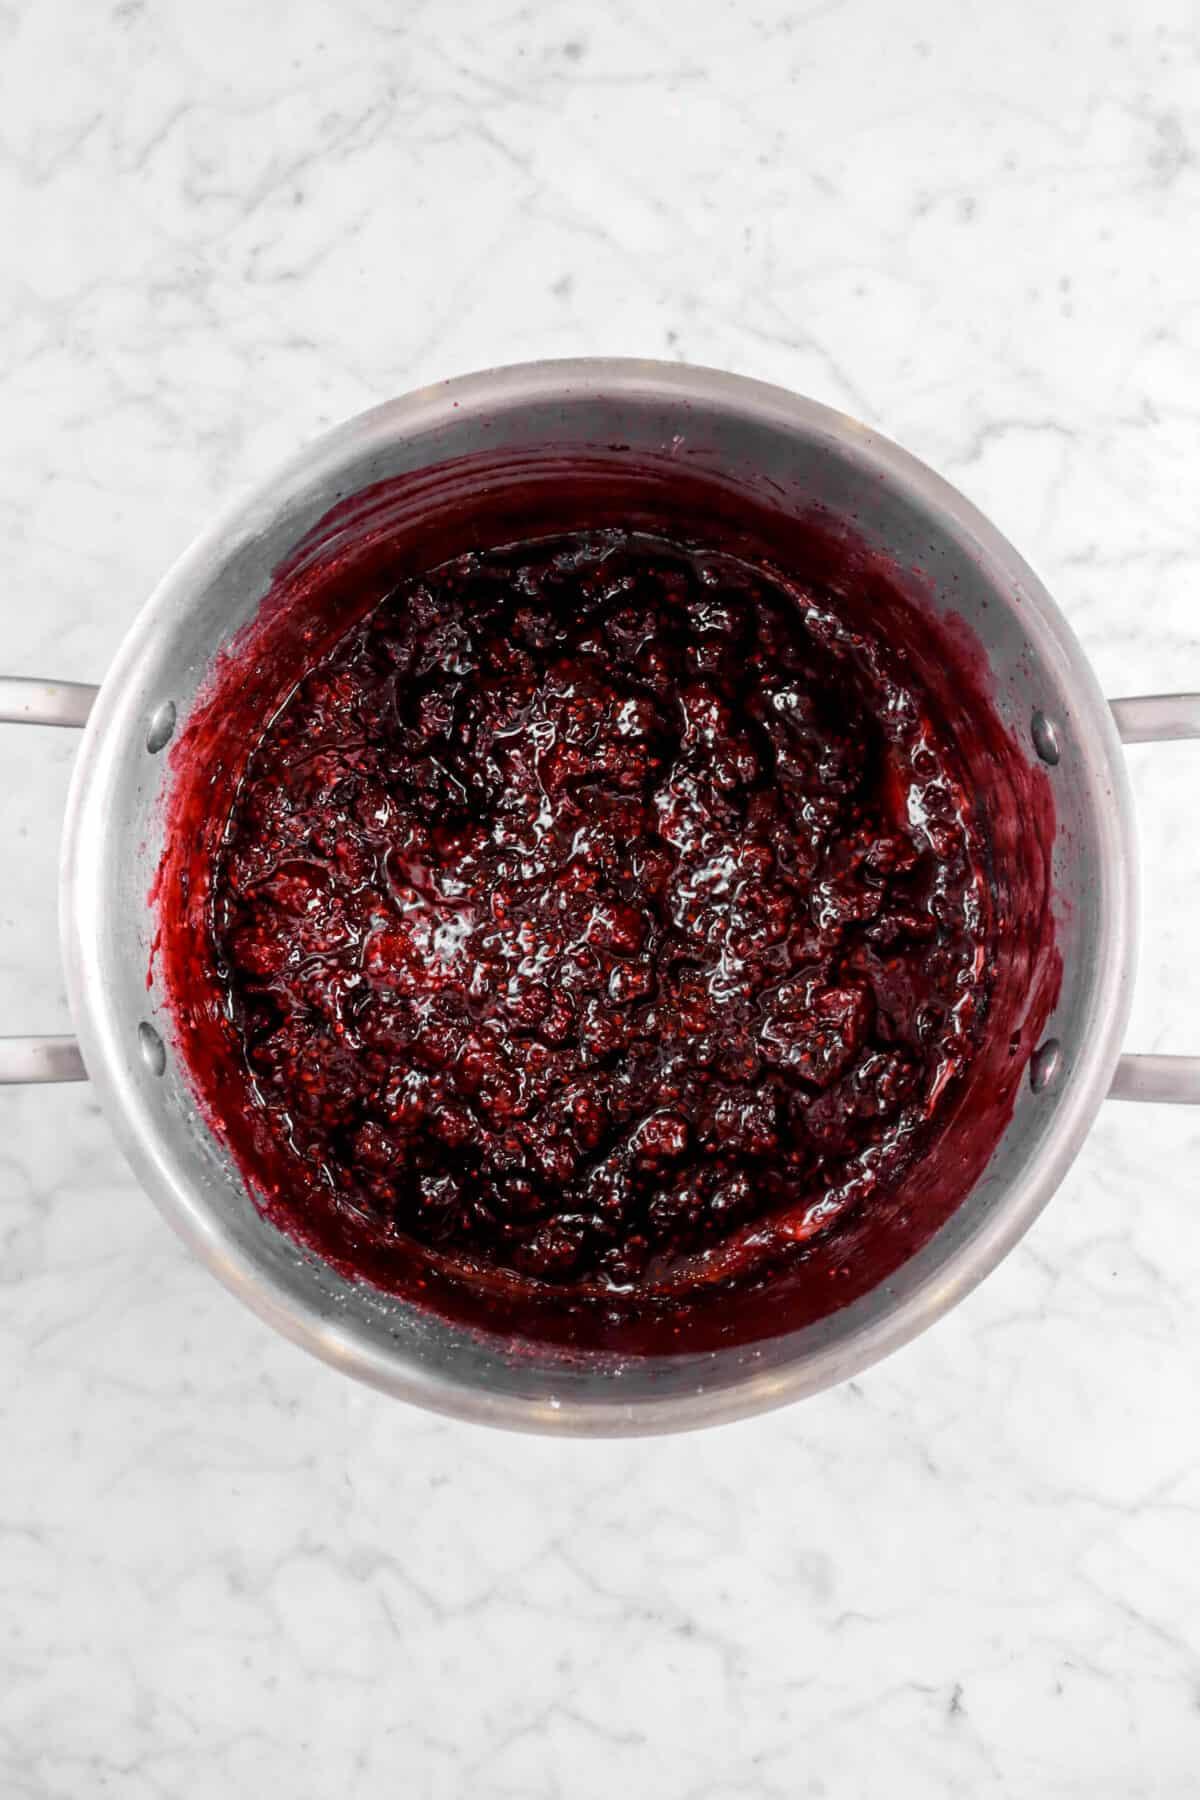 blackberry jam in a large pot